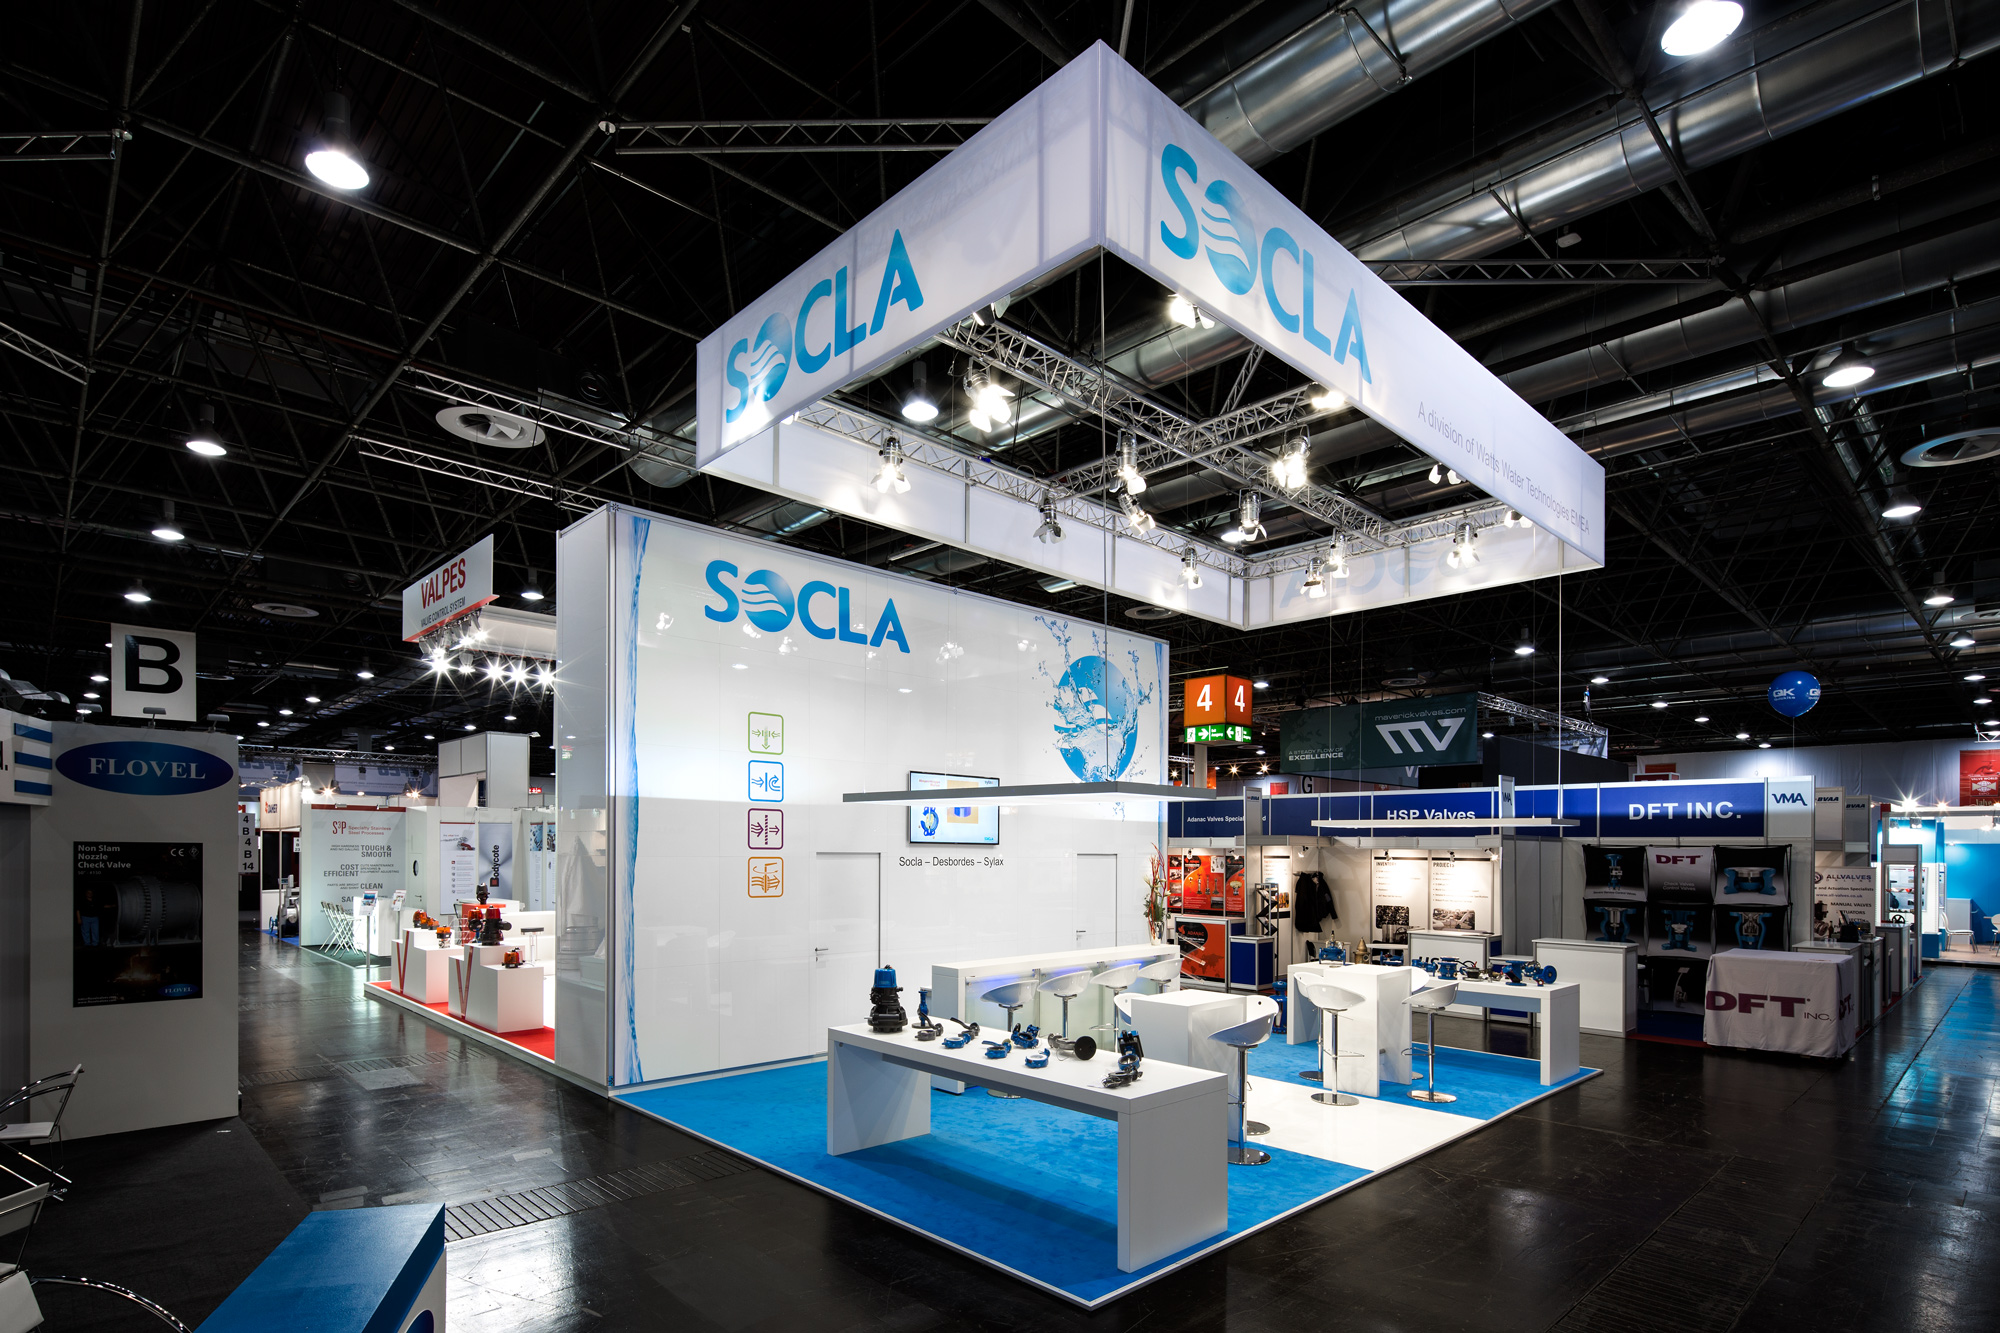 Messestand Socla Valve World 2014 Düsseldorf